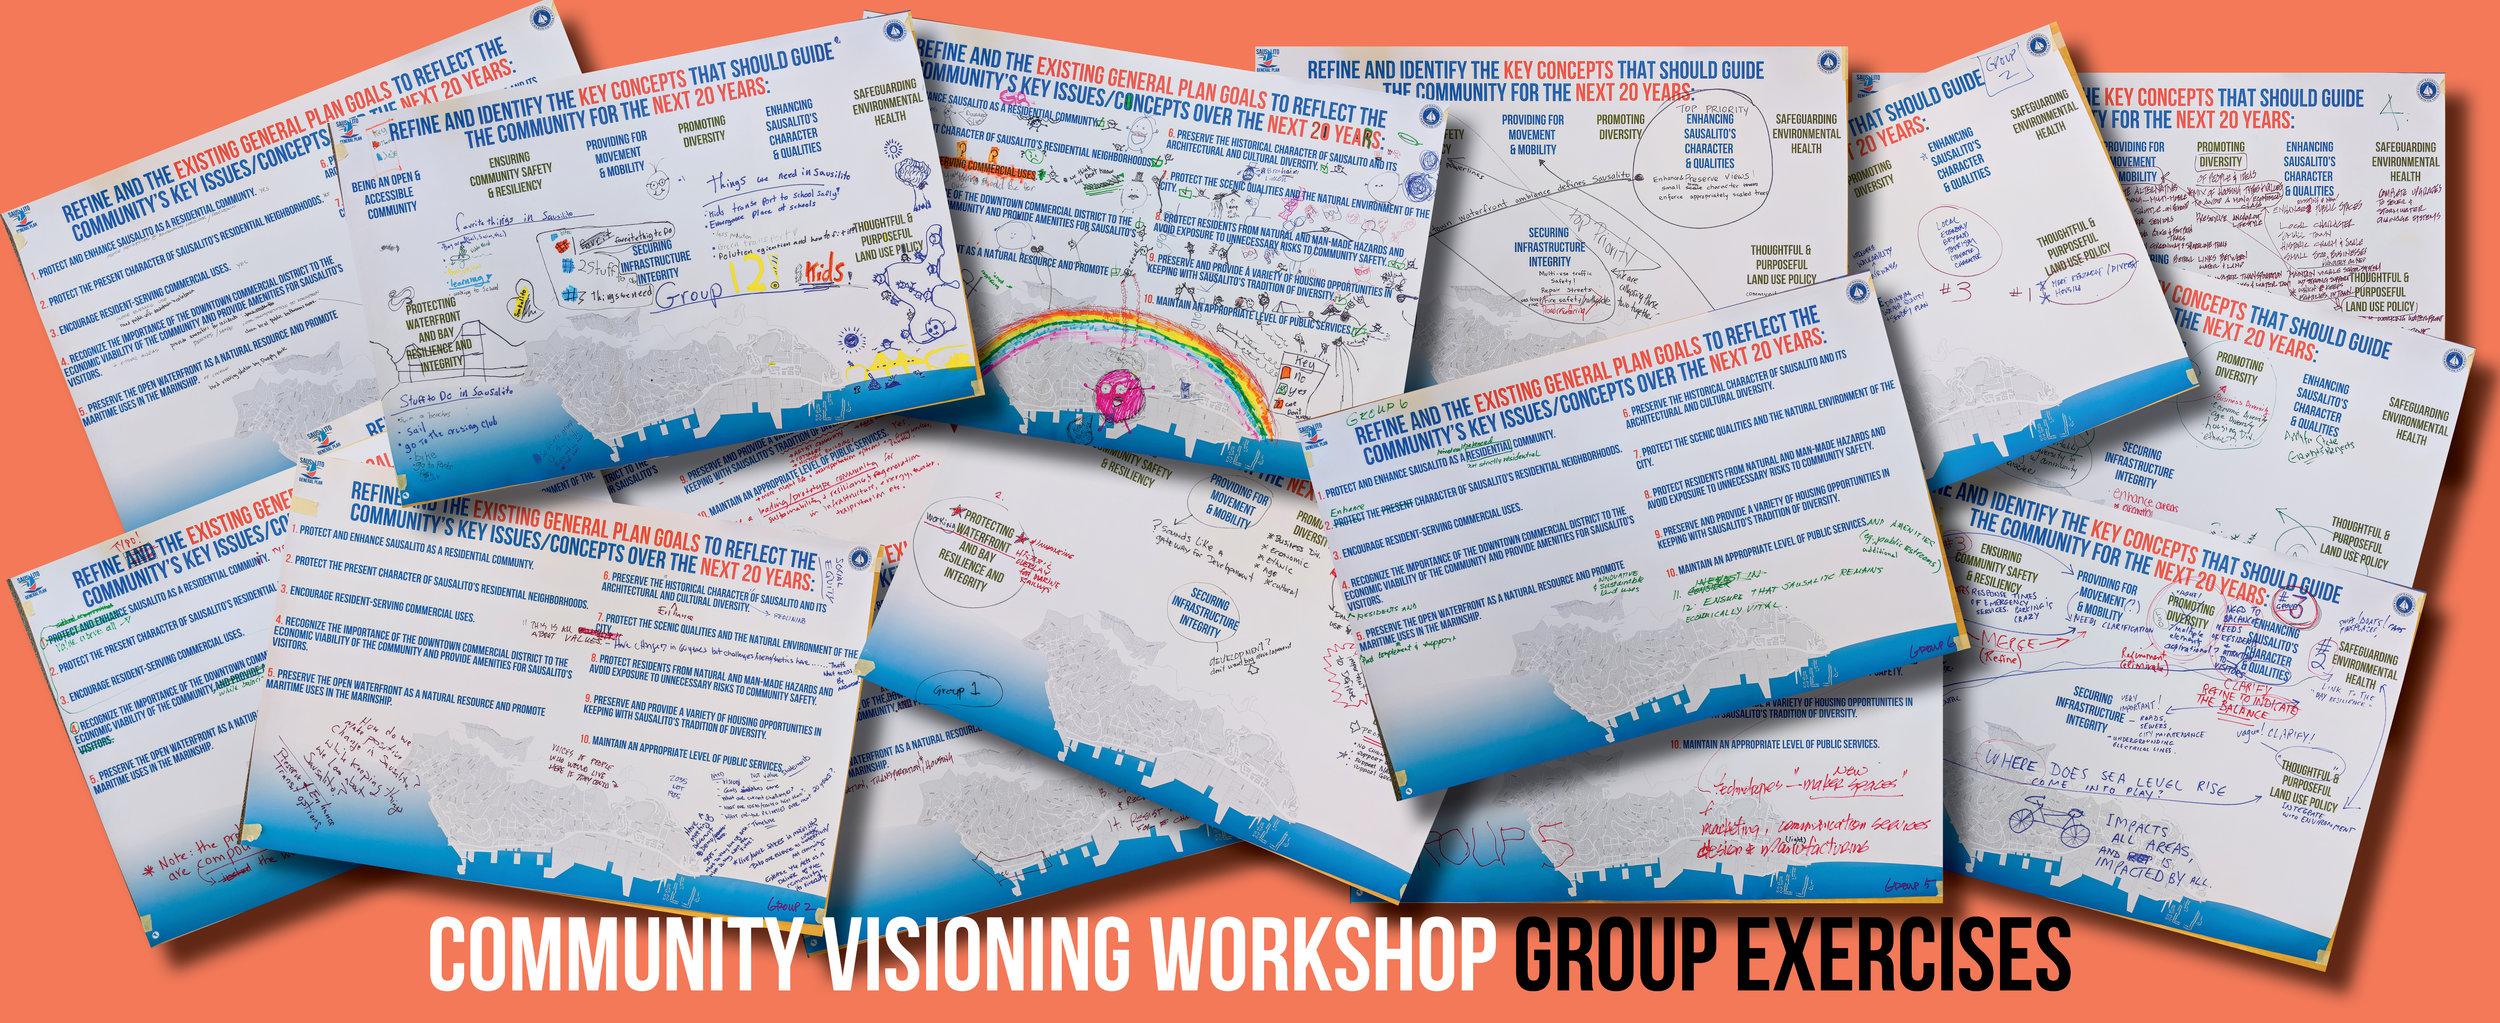 Visioning.Workshop_Thumbnail.jpg